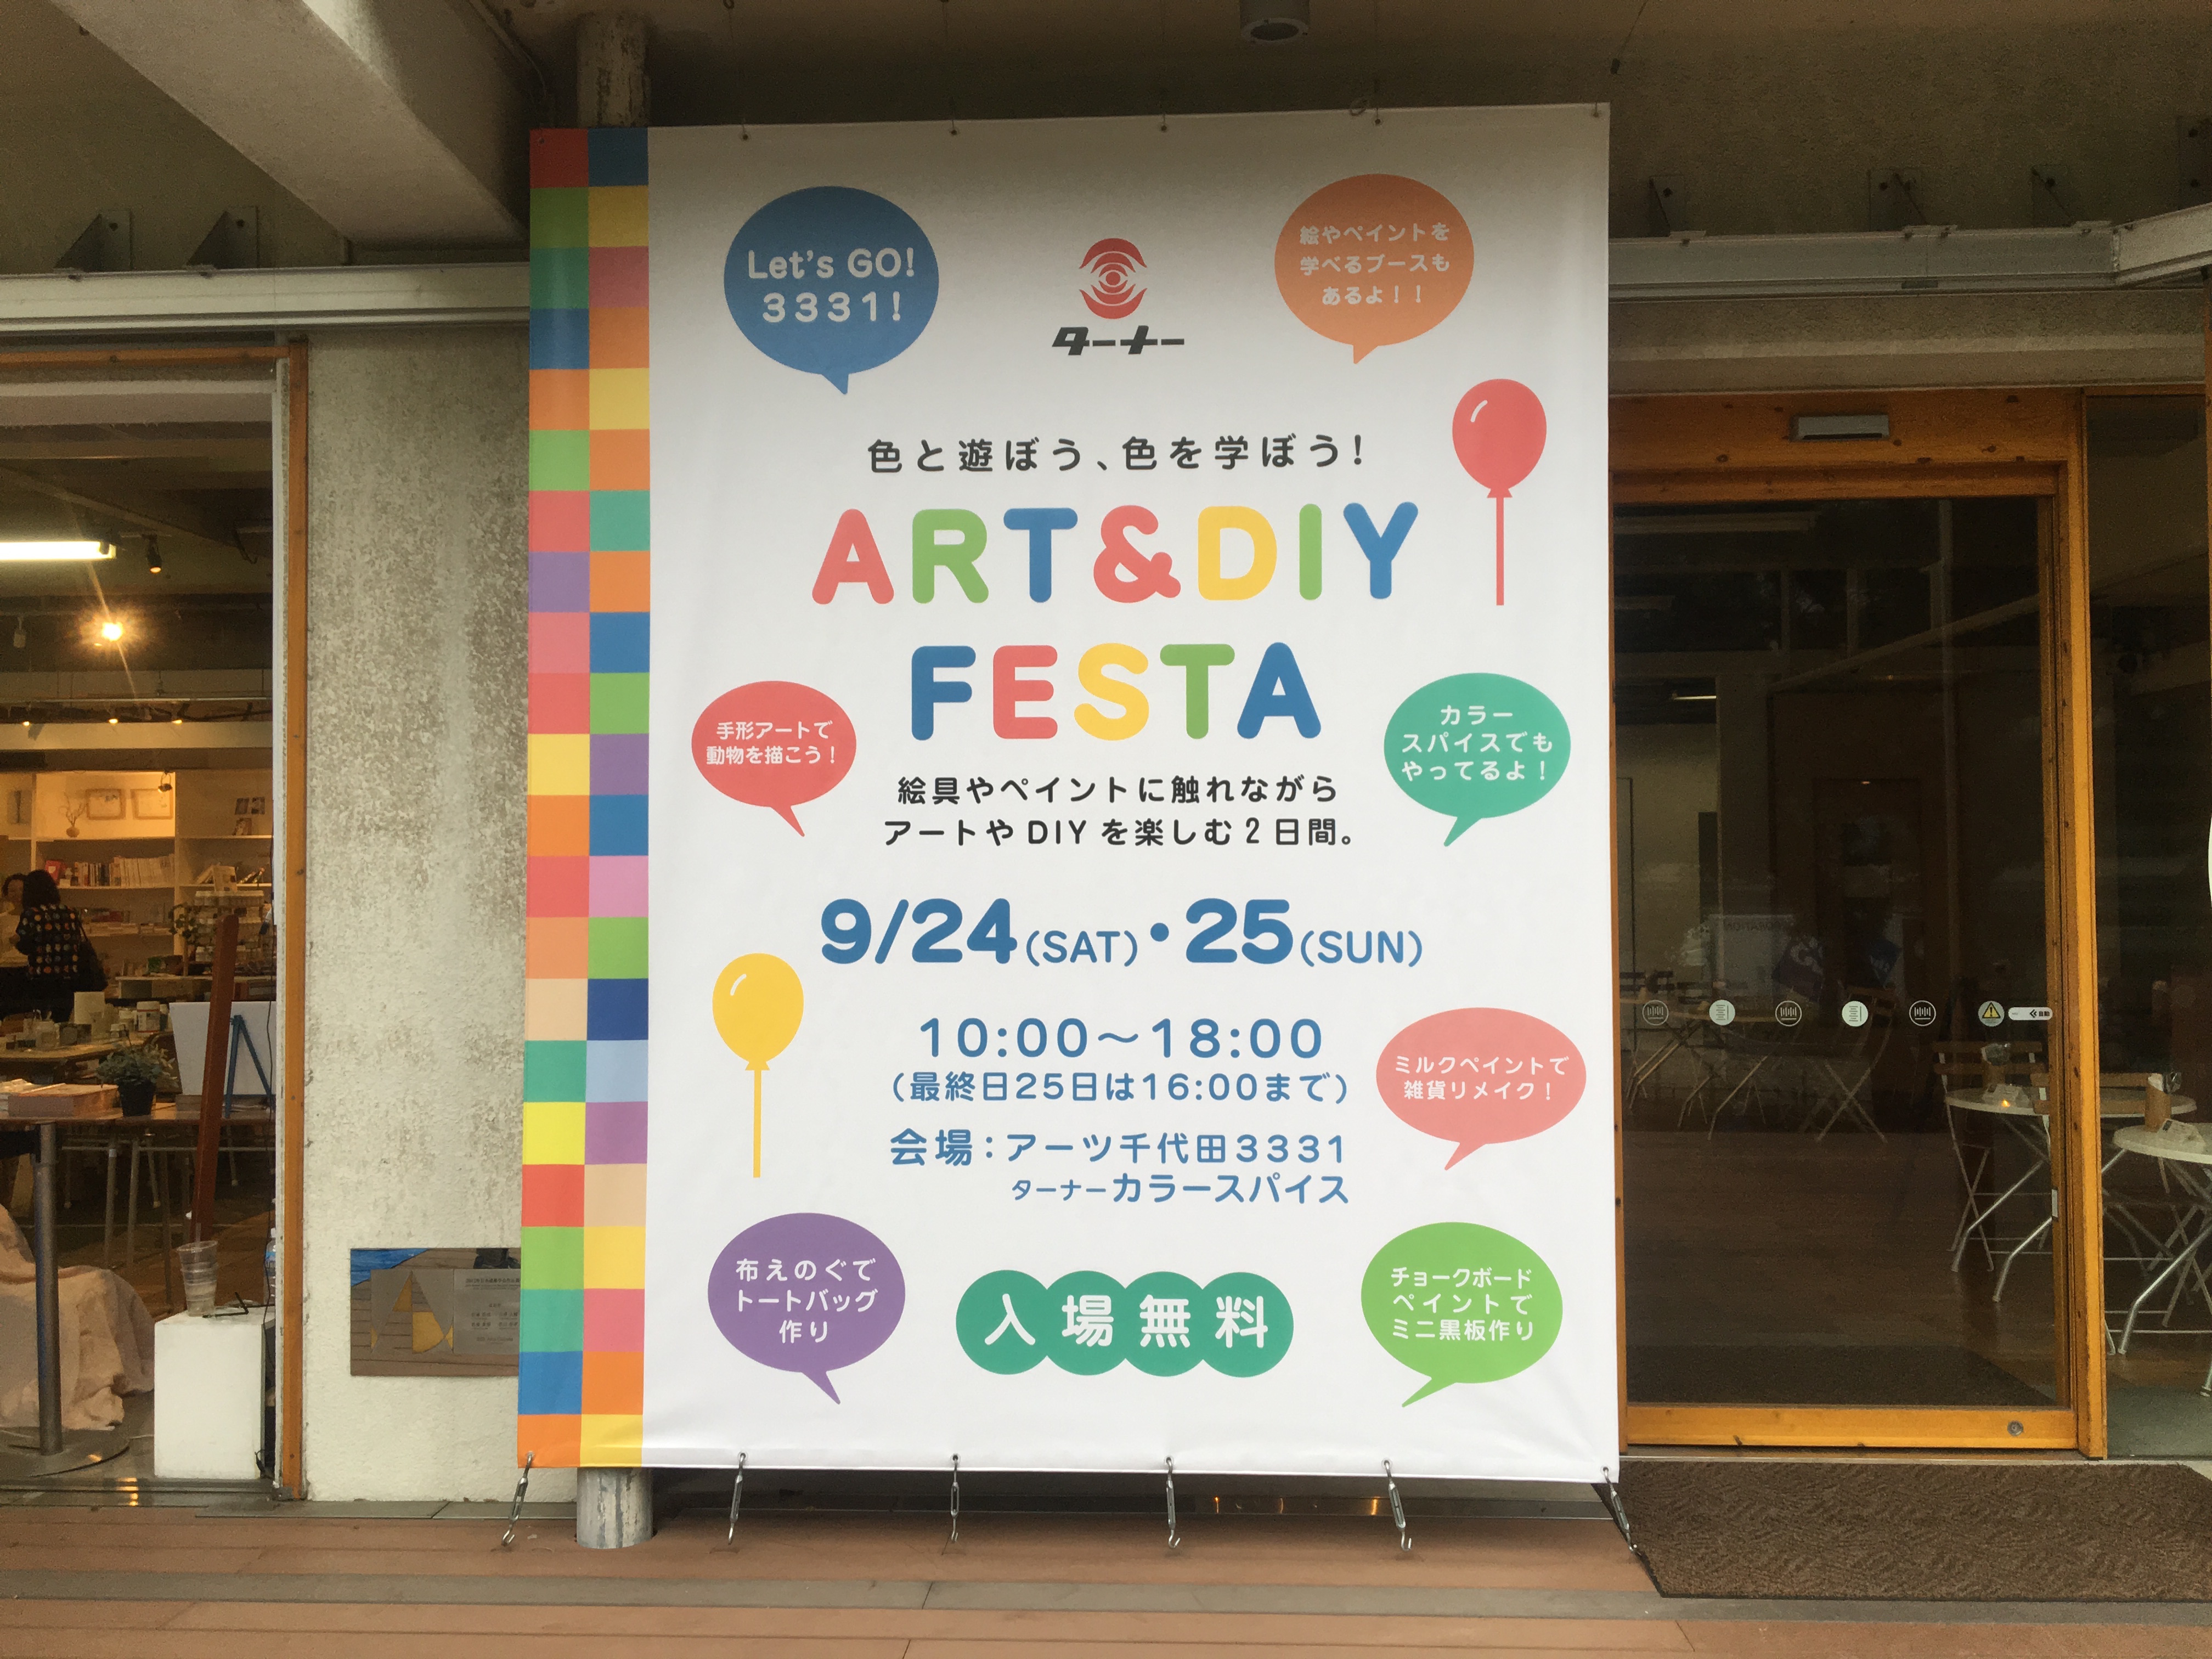 ART&DIYフェスタに行ってきた!